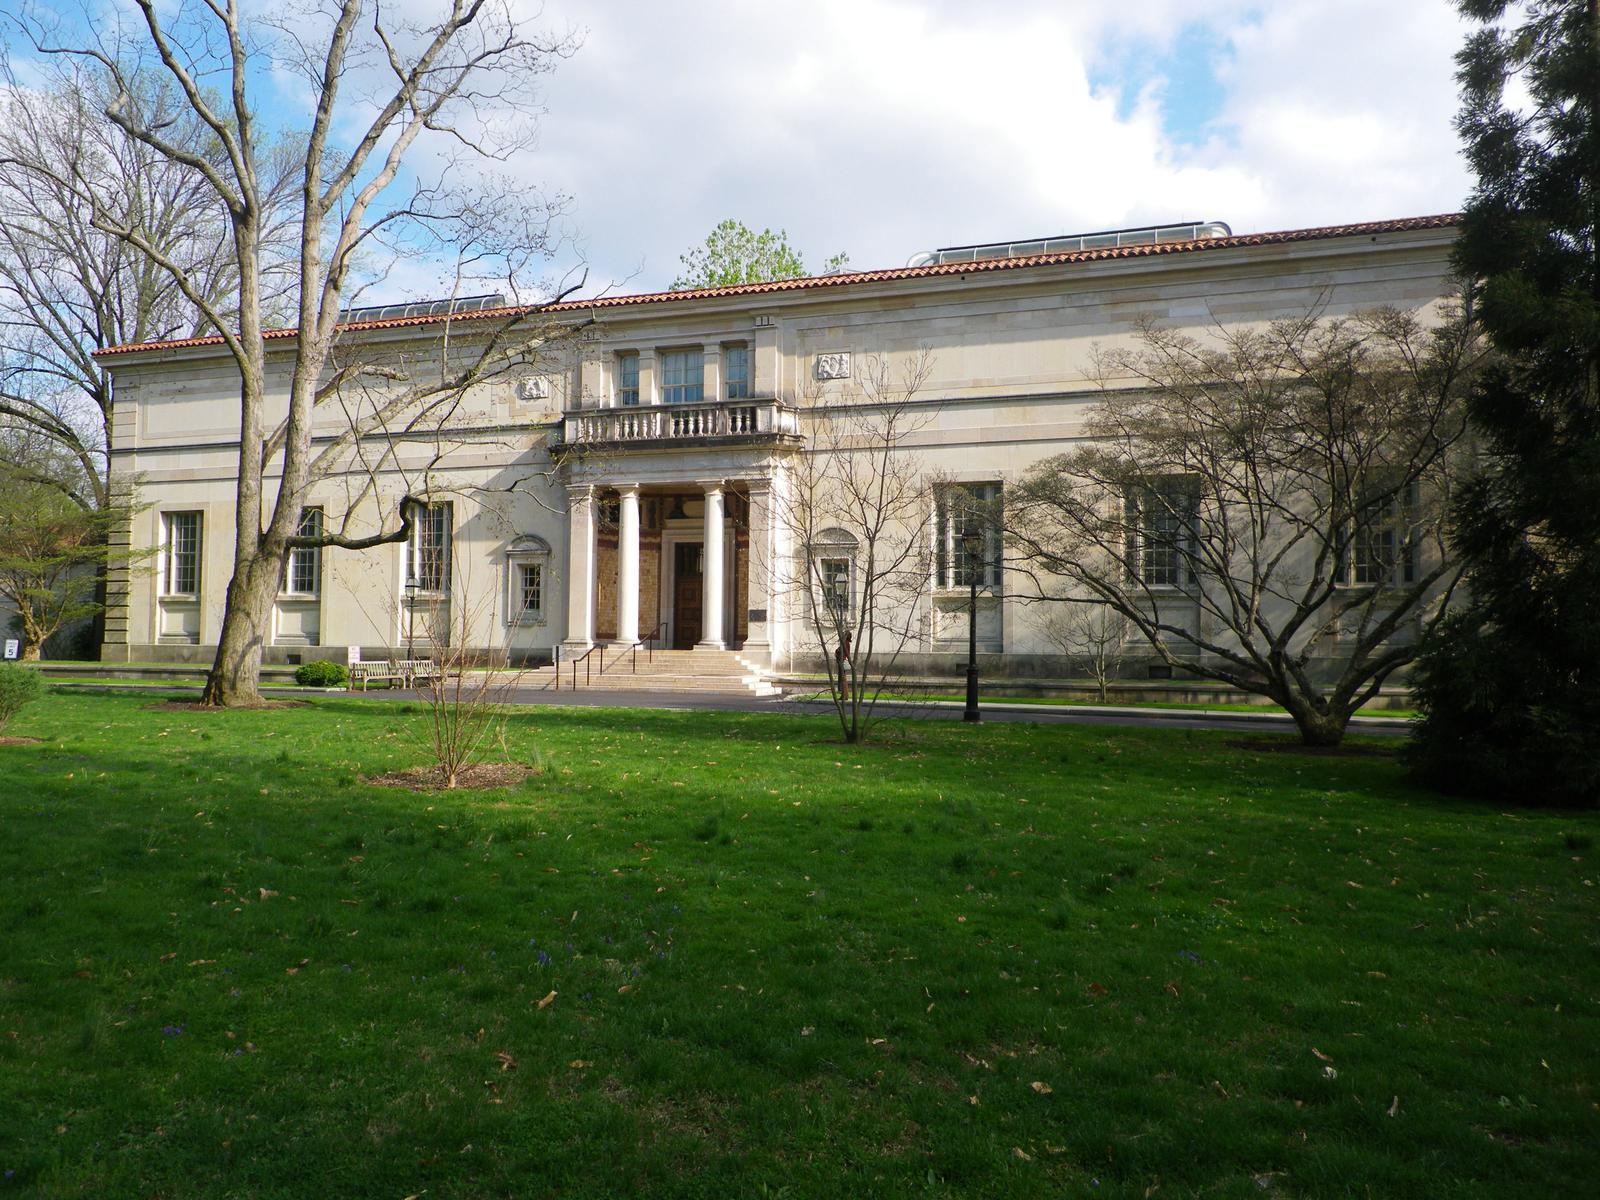 Barnes Foundation on the Philadelphia Parkway | Geno's ...